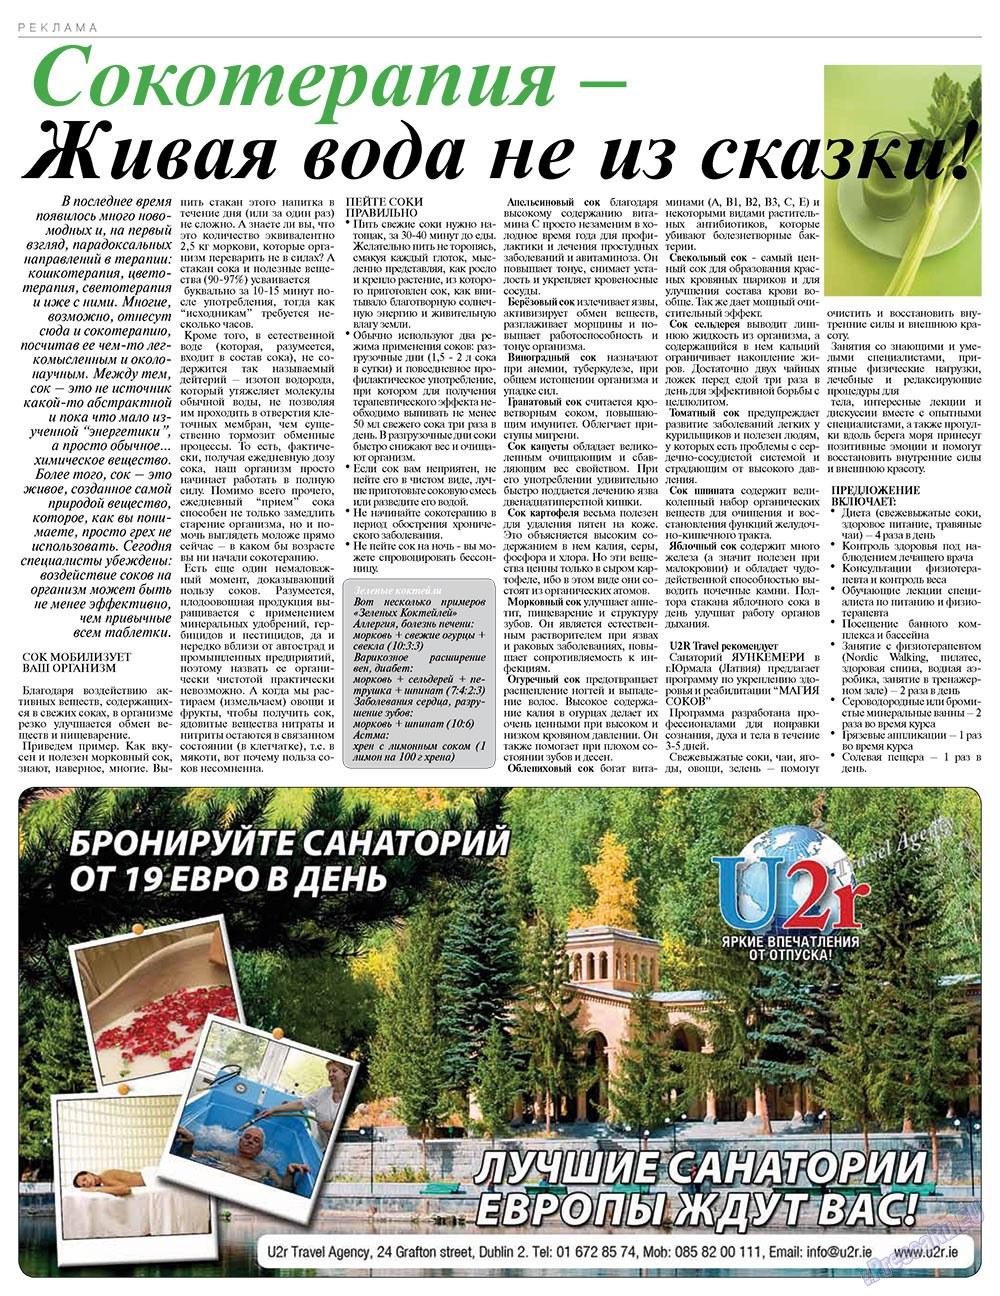 Дублин инфоцентр (газета). 2011 год, номер 3, стр. 4